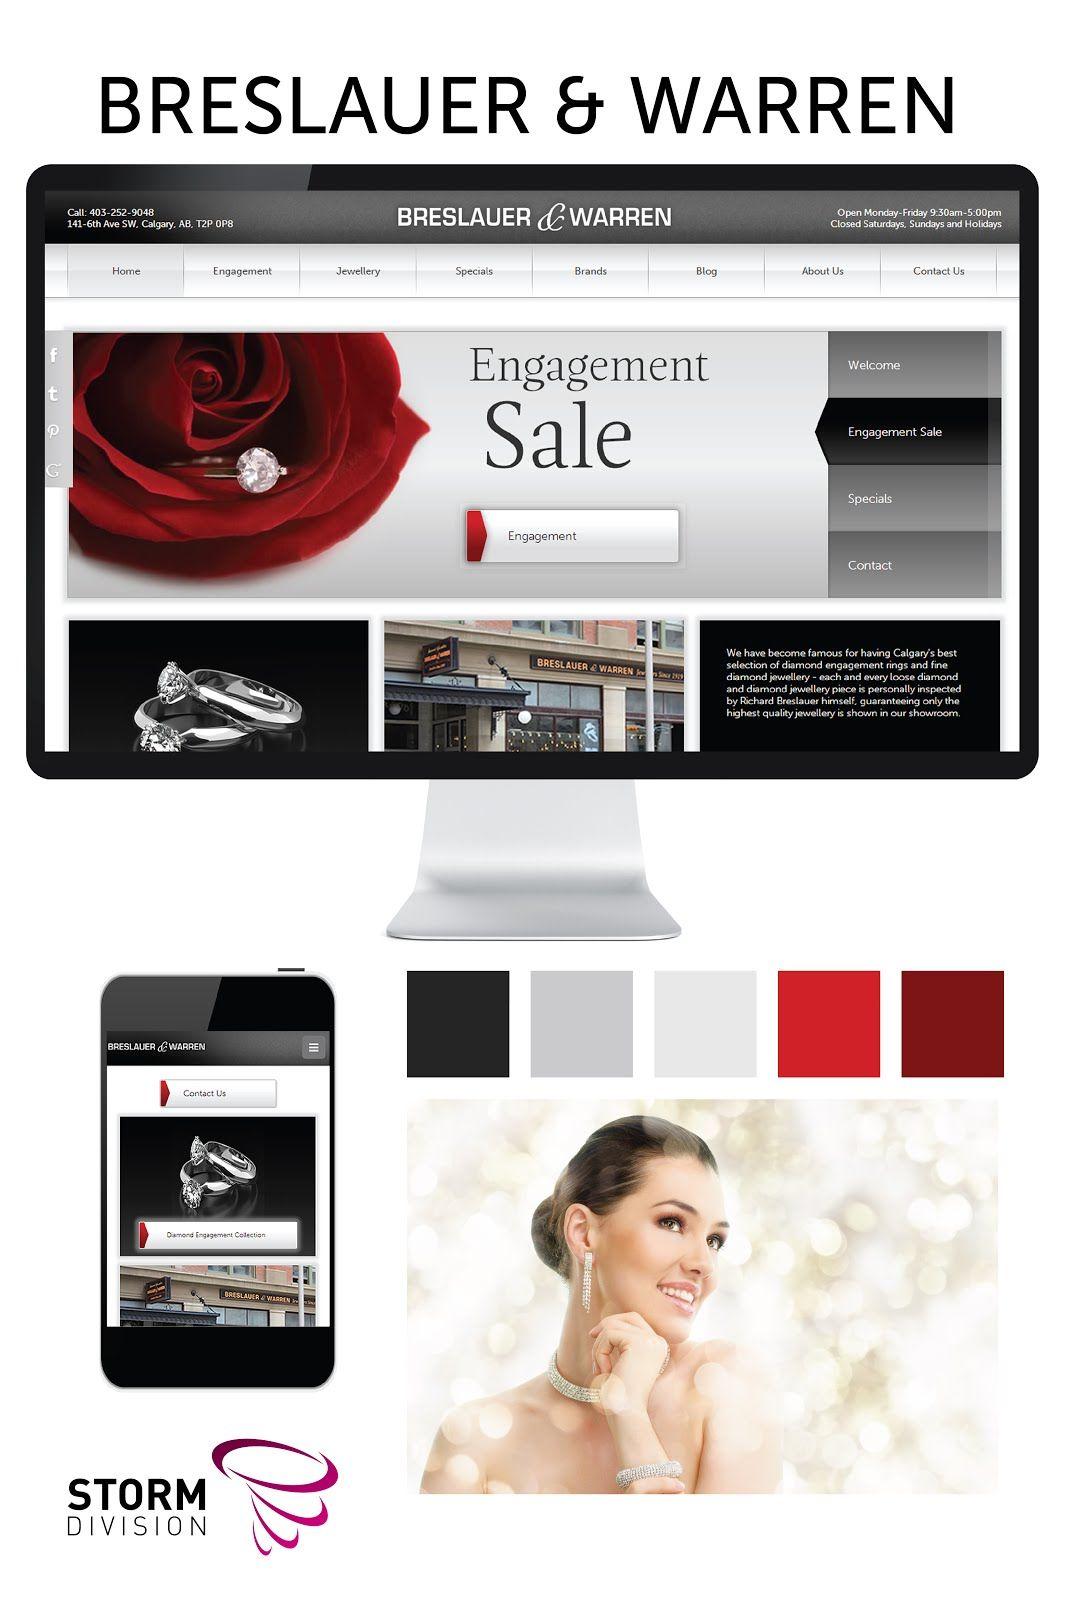 Breslauer Warren Custom Web Design Full Responsive Web Site Custom Web Design Online Marketing Web Design